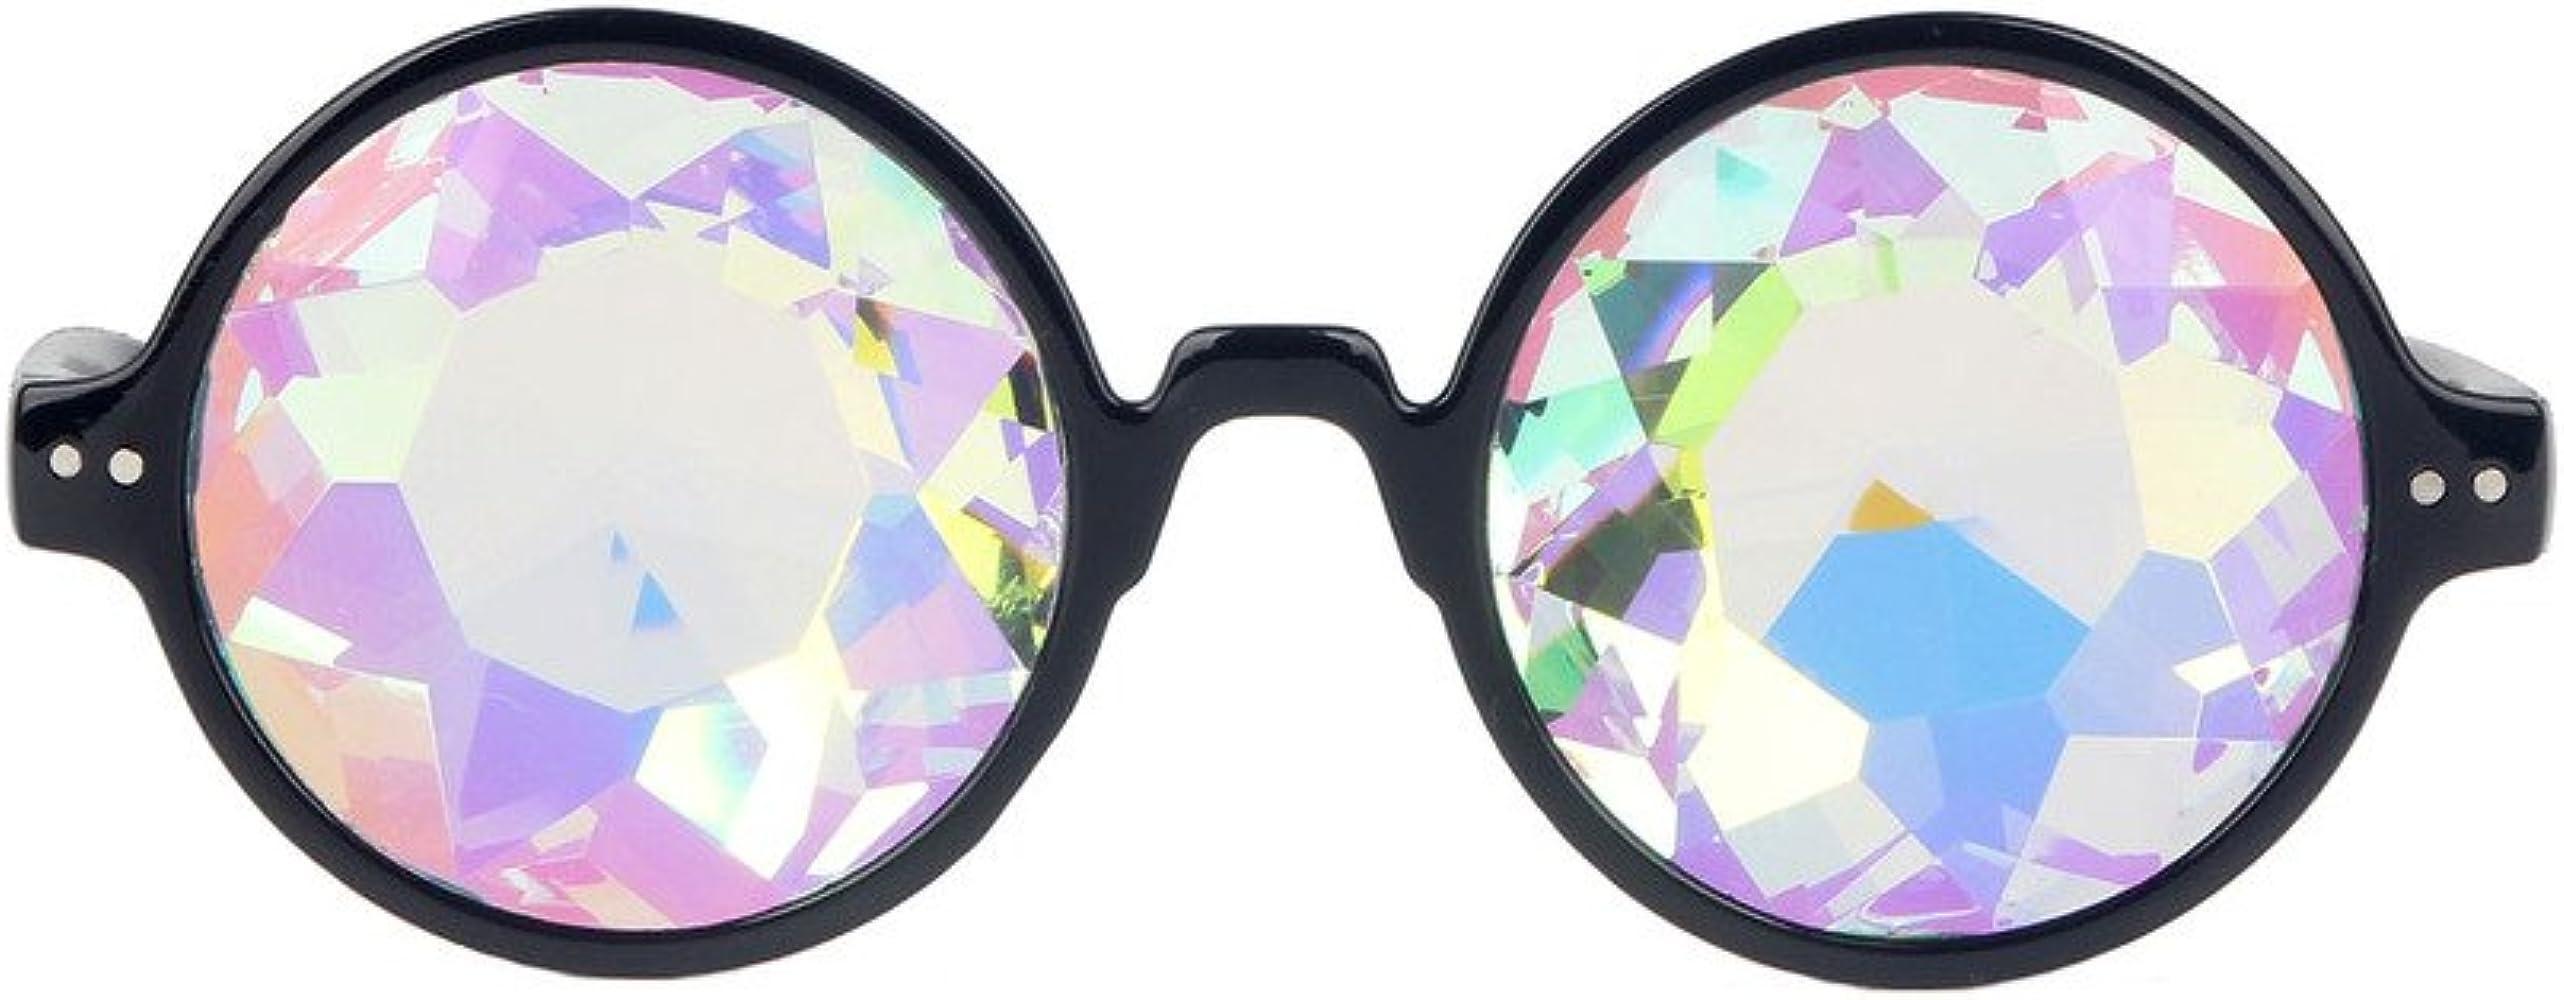 Kaleidoscope Glasses Rave Festival Party Sunglasses Diffracted Lens-Black J6P1